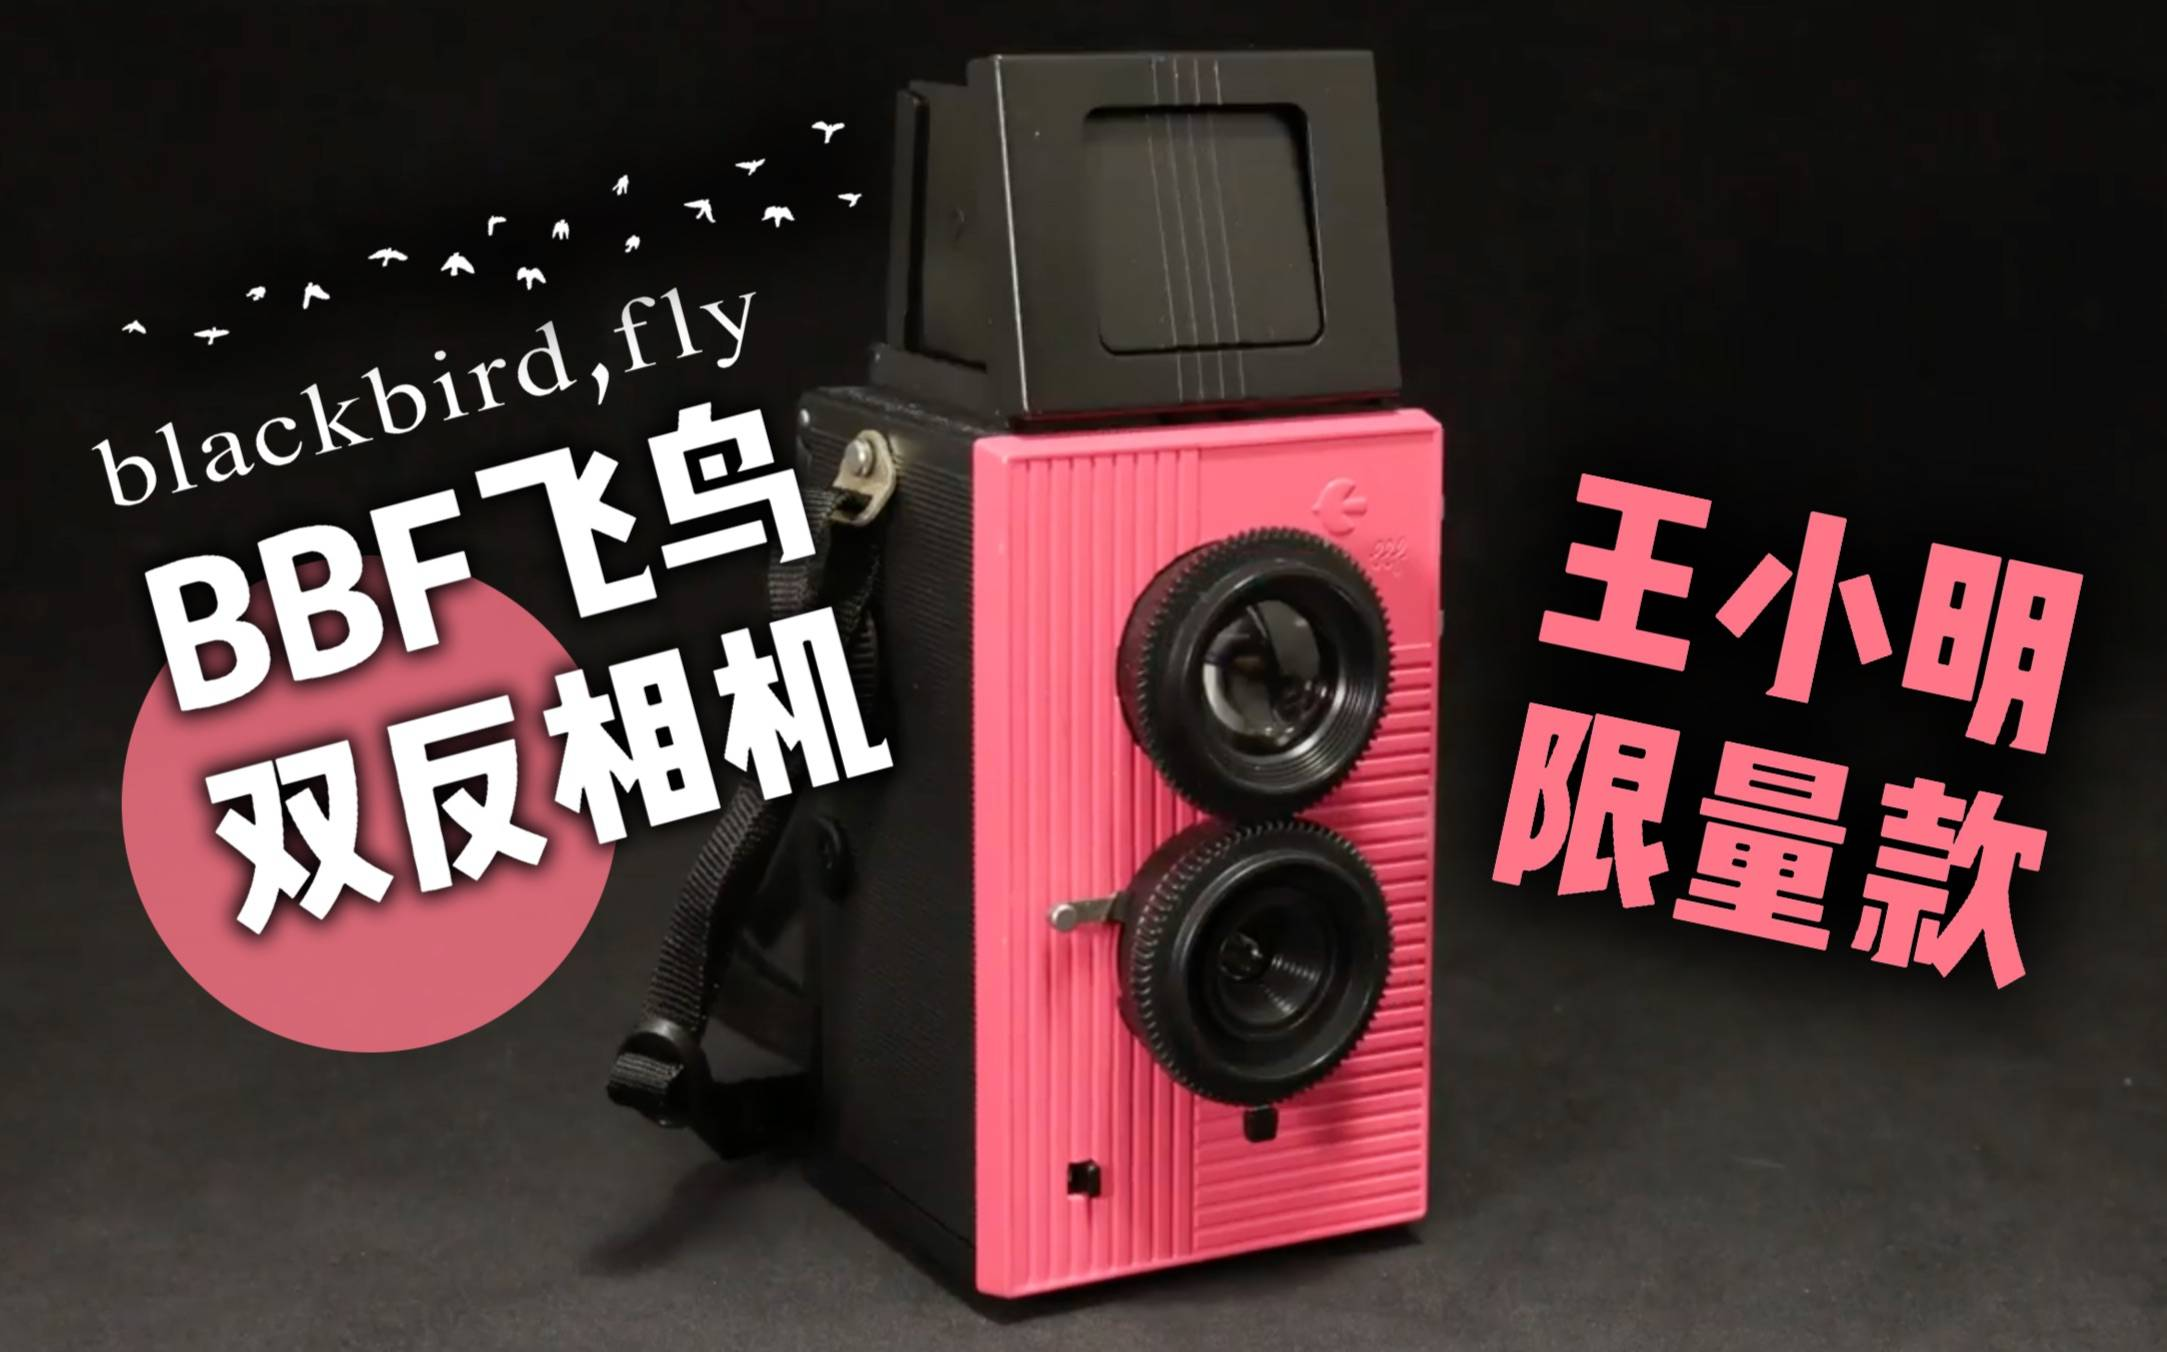 【Youtube转载】王小明限量款! BBF飞鸟 Lomo双反相机 开盒评测! ! !